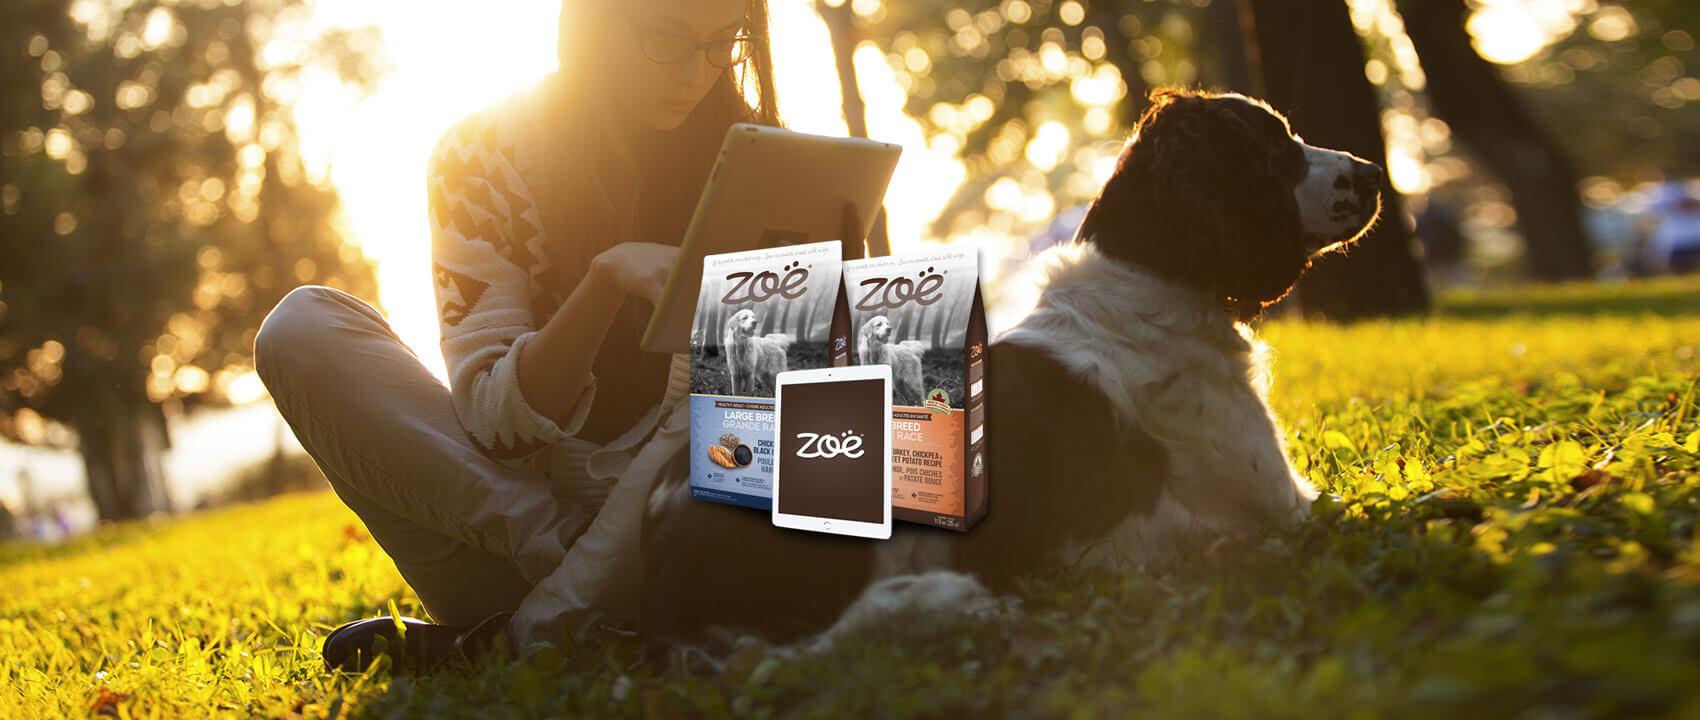 zoe-ipad-giveaway-banner